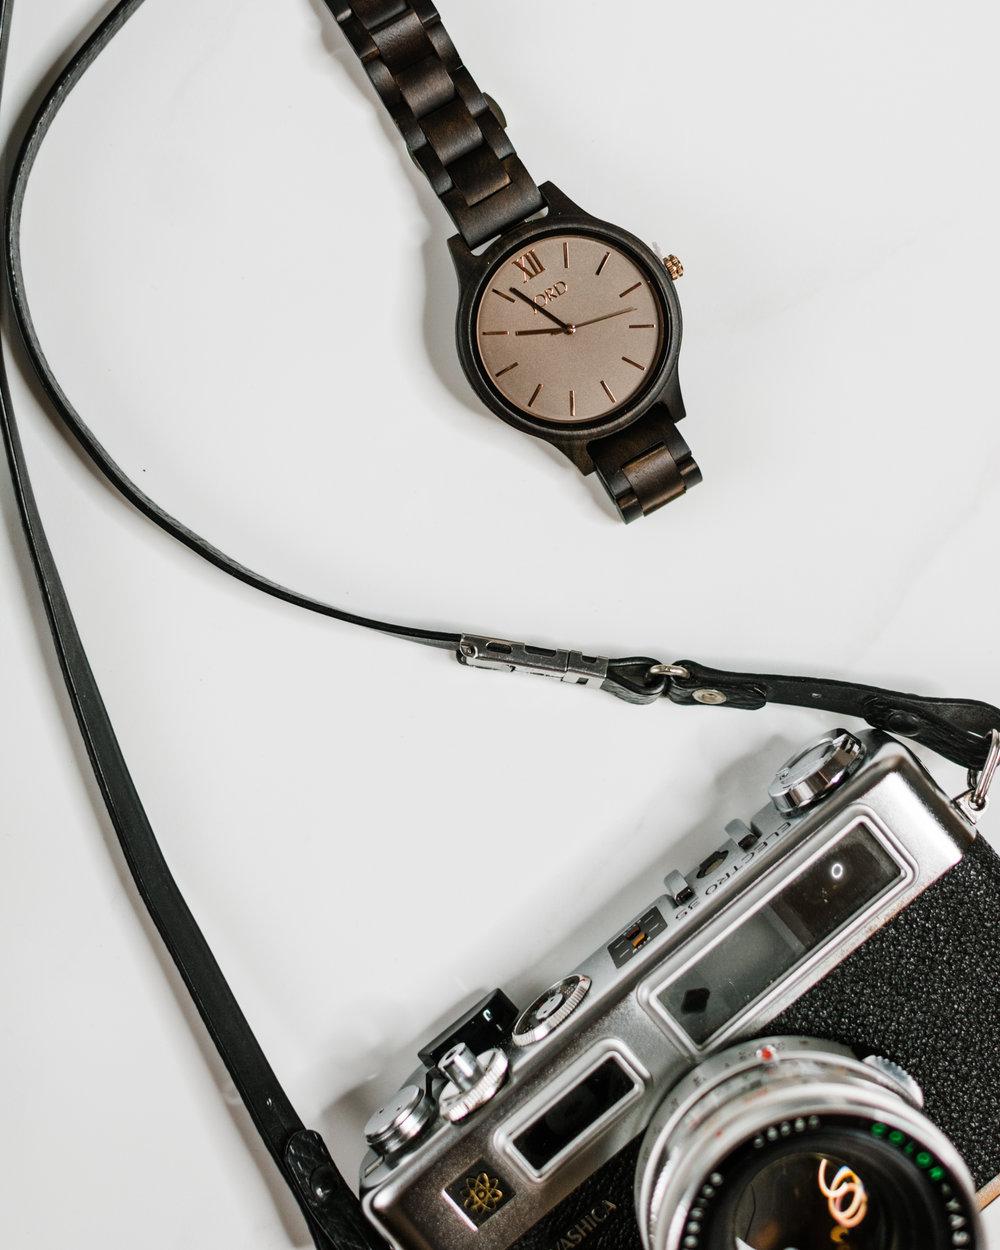 jord wood watch frankie series dark sandalwood yashica 35 mm - style apotheca